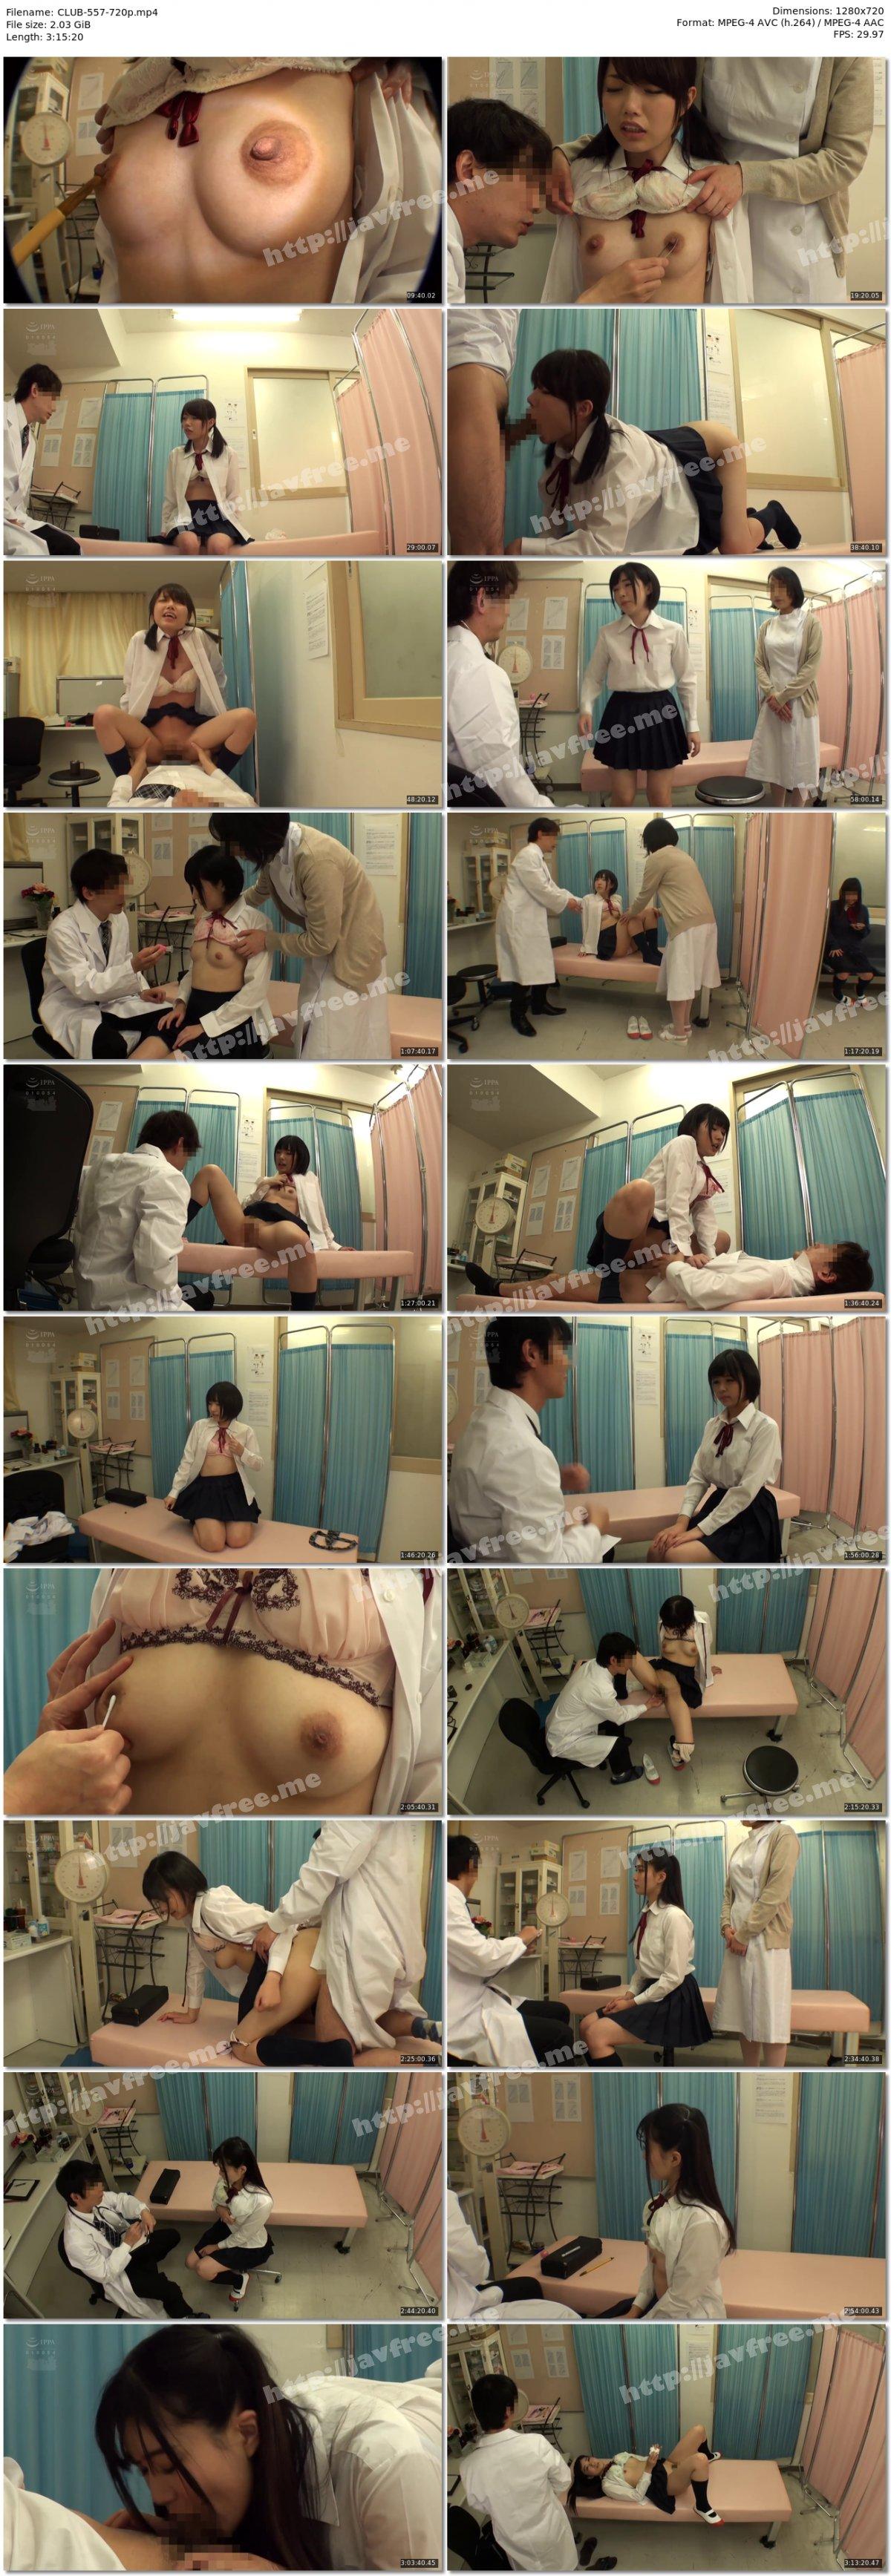 [HD][CLUB-557] 制服女子ばかりを狙う悪徳医師の乳首こねくり健康診断4 - image CLUB-557-720p on https://javfree.me